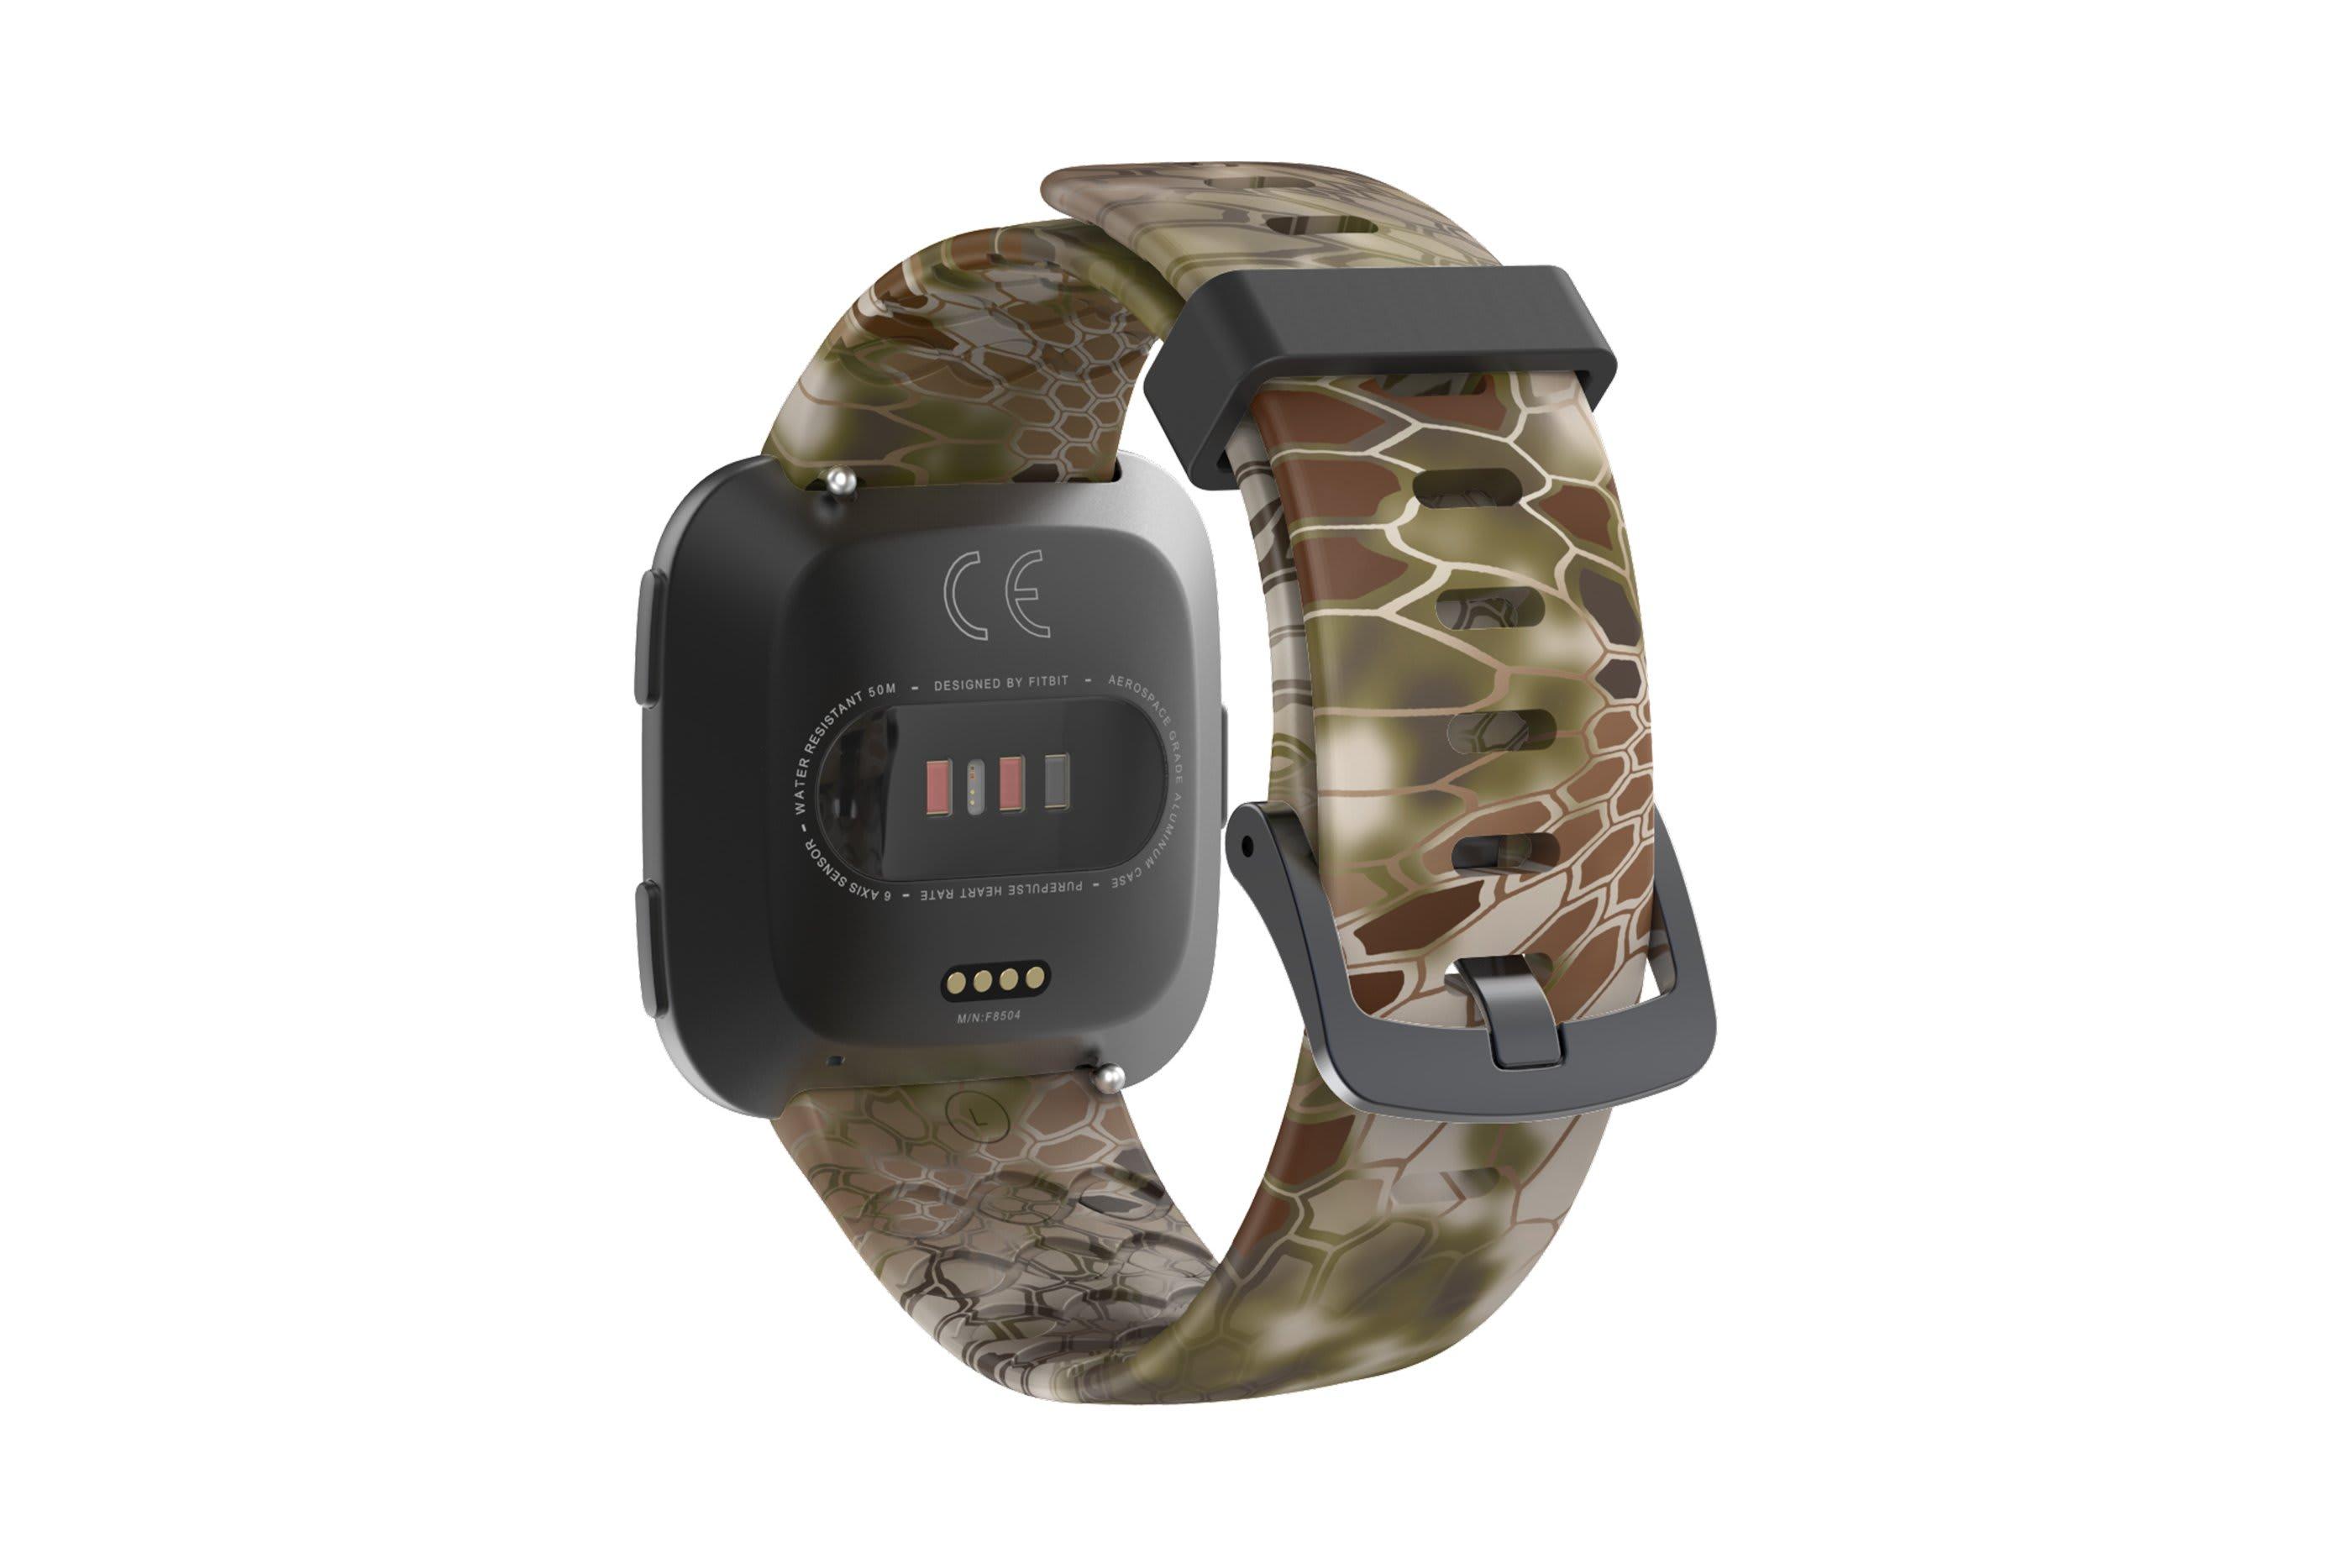 Kryptek Highlander Fitbit Versa watch band viewed top down